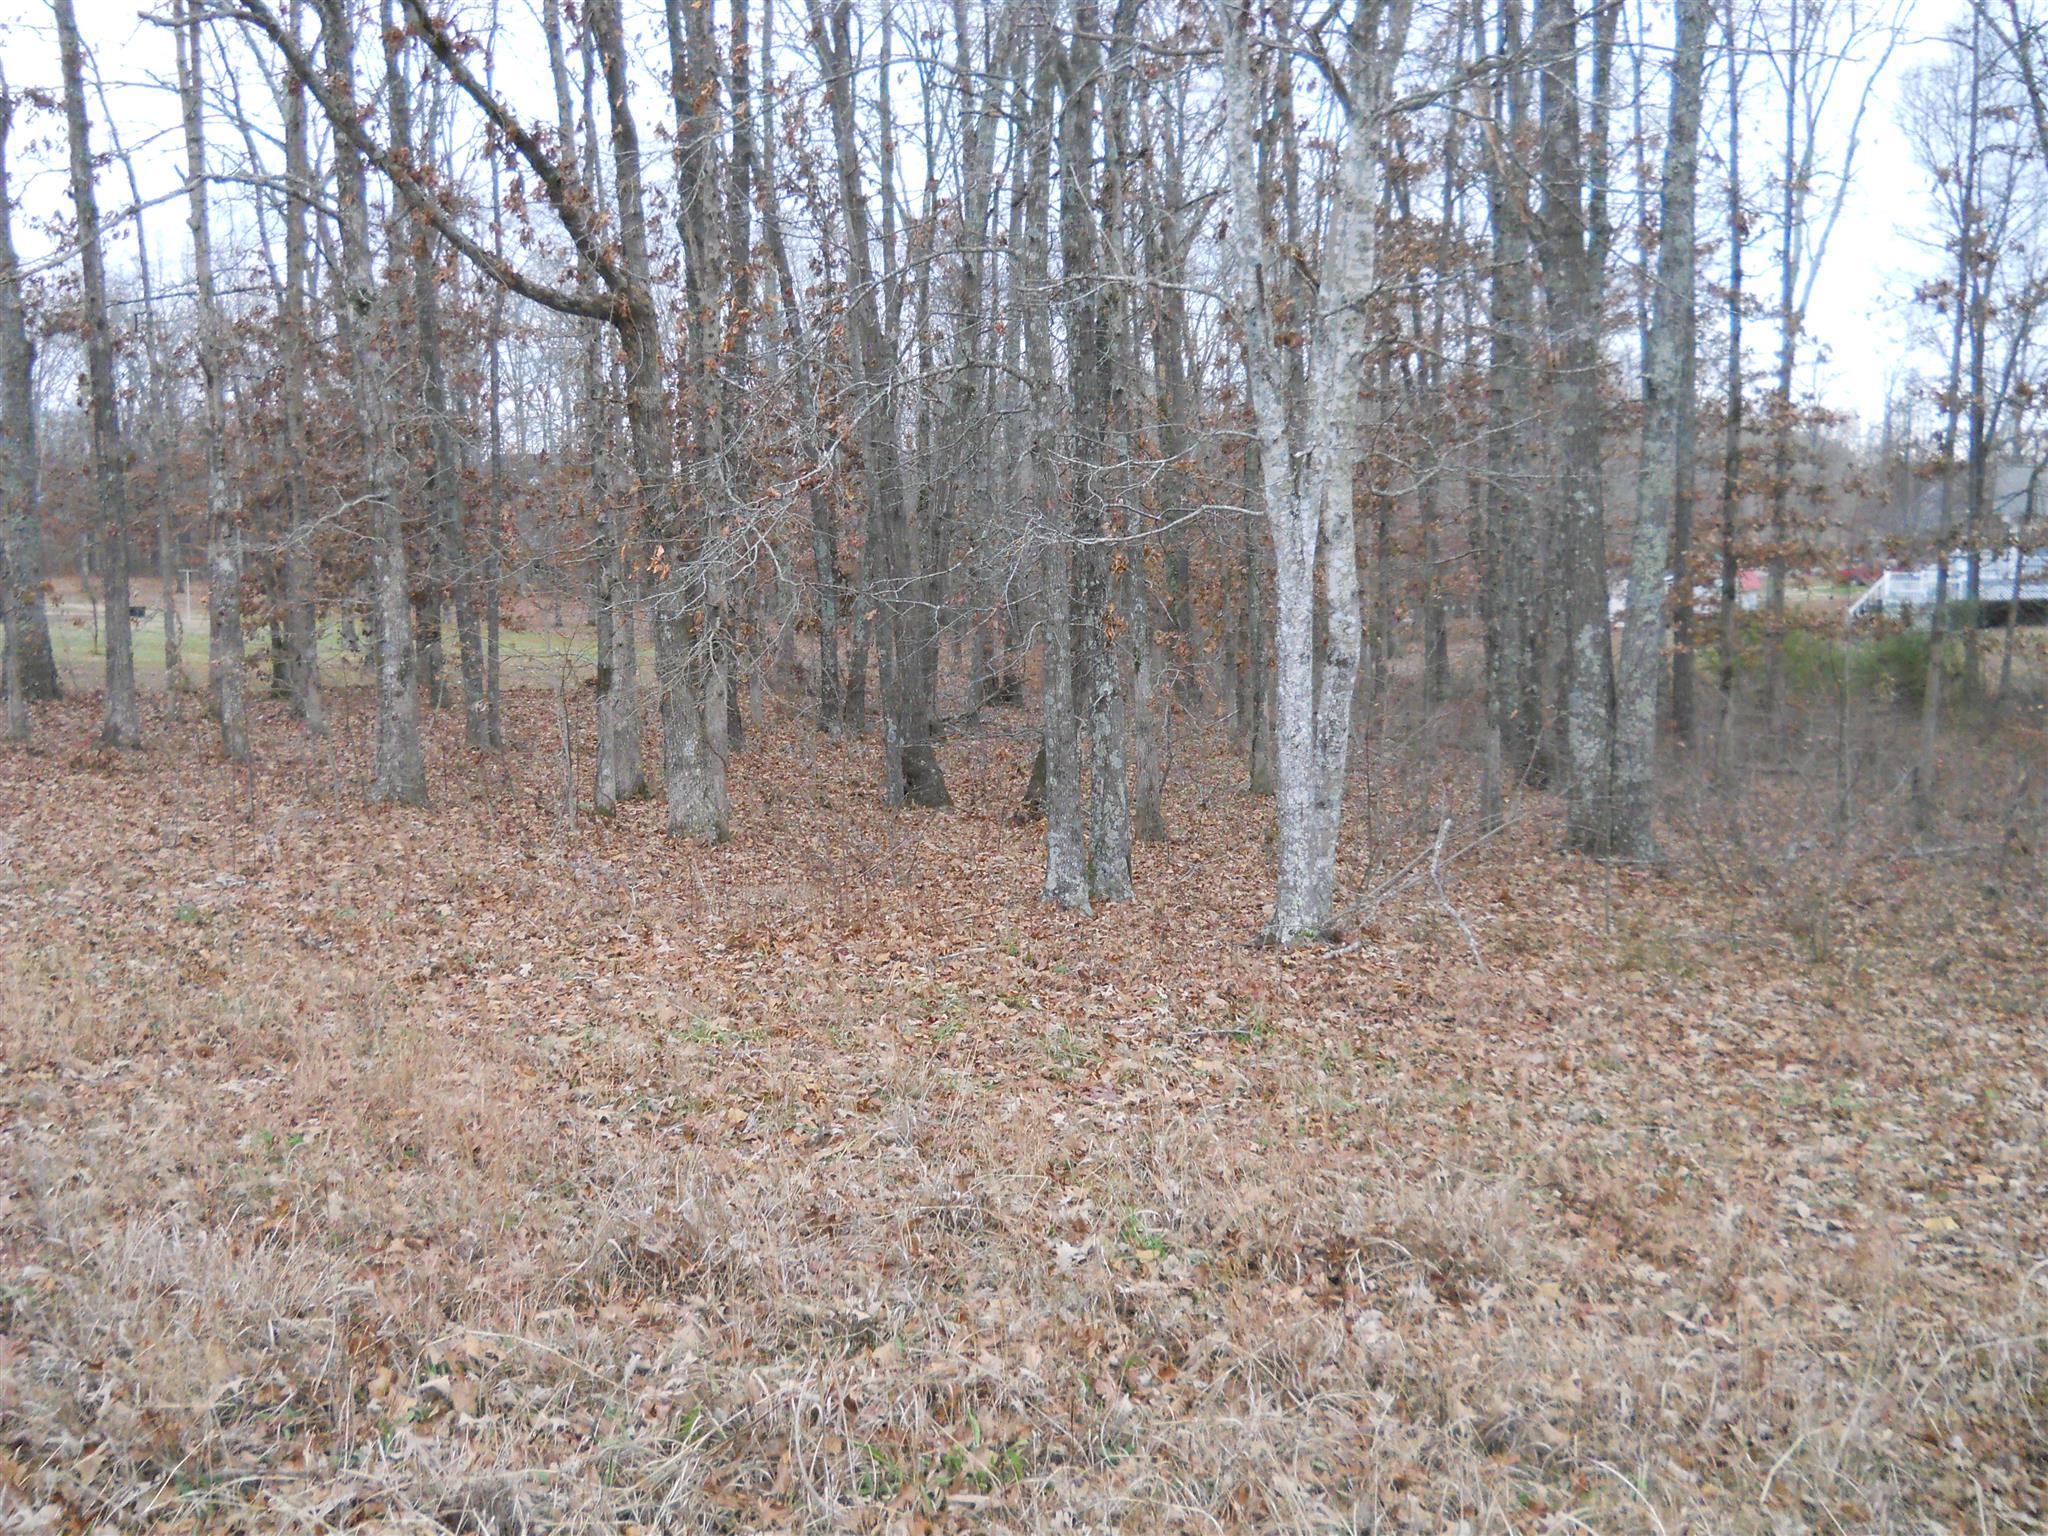 0 Pin Oaks Ln, Hohenwald, TN 38462 - Hohenwald, TN real estate listing